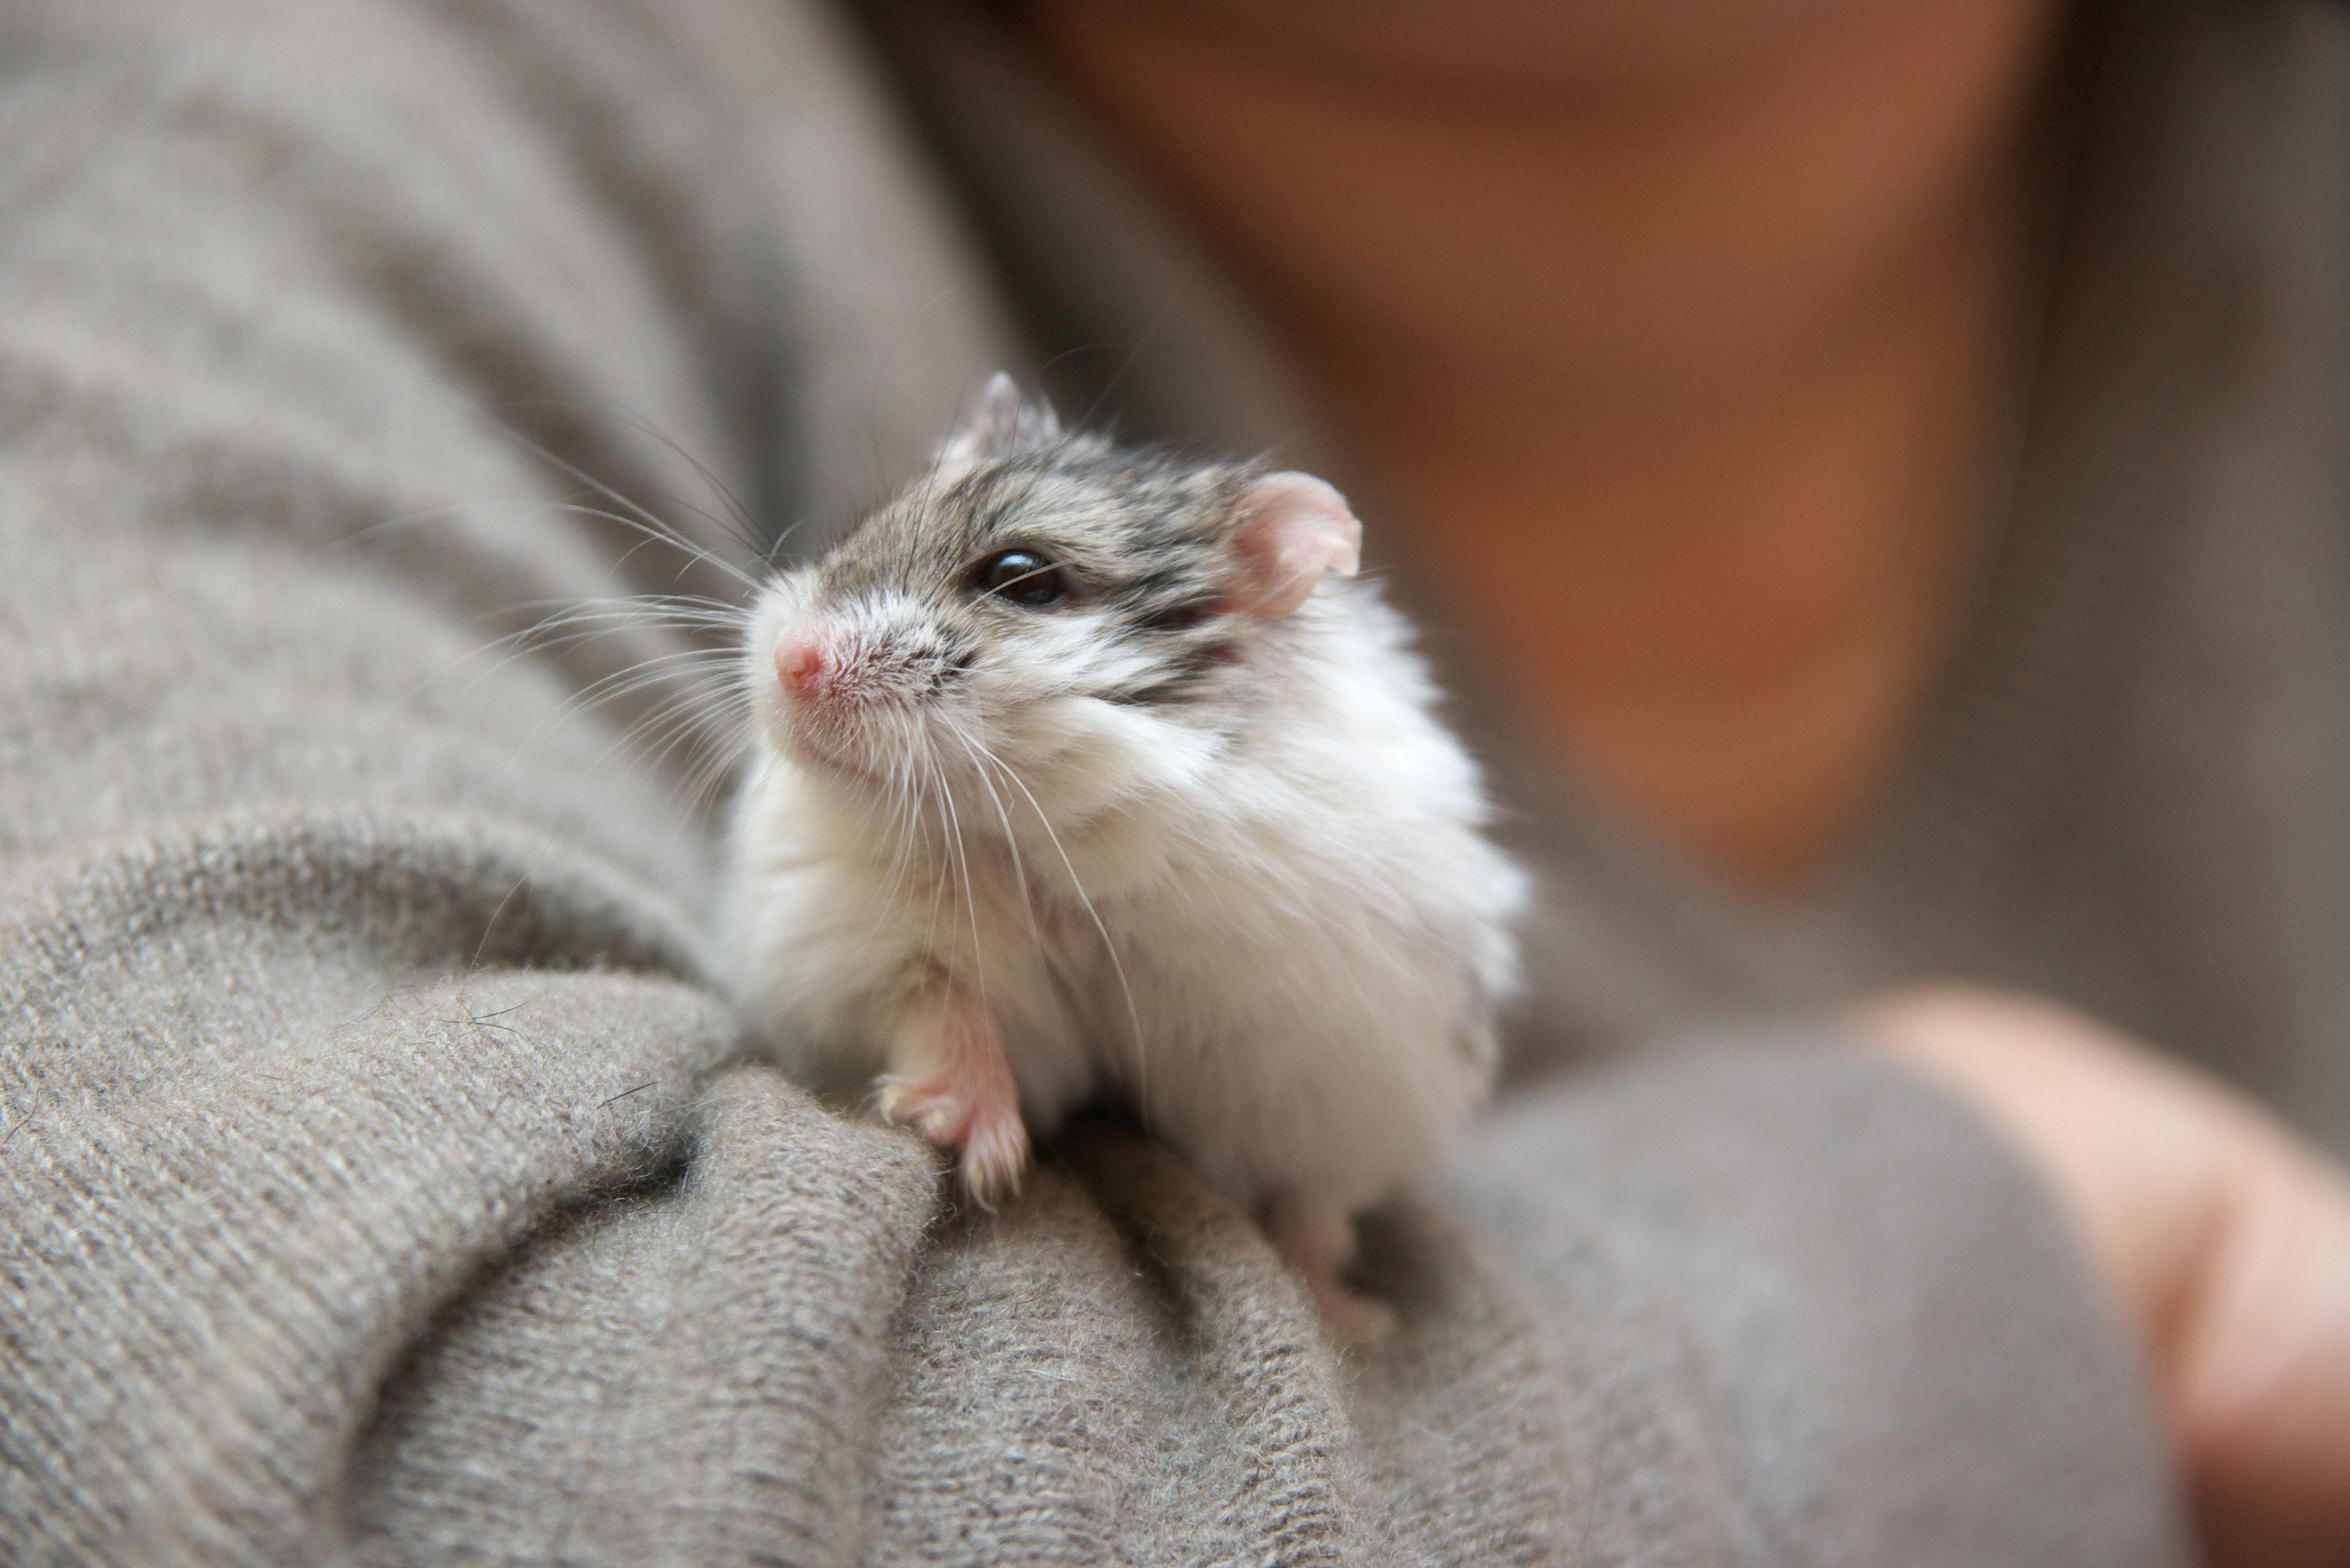 Studentin spült Hamster im Klo runter